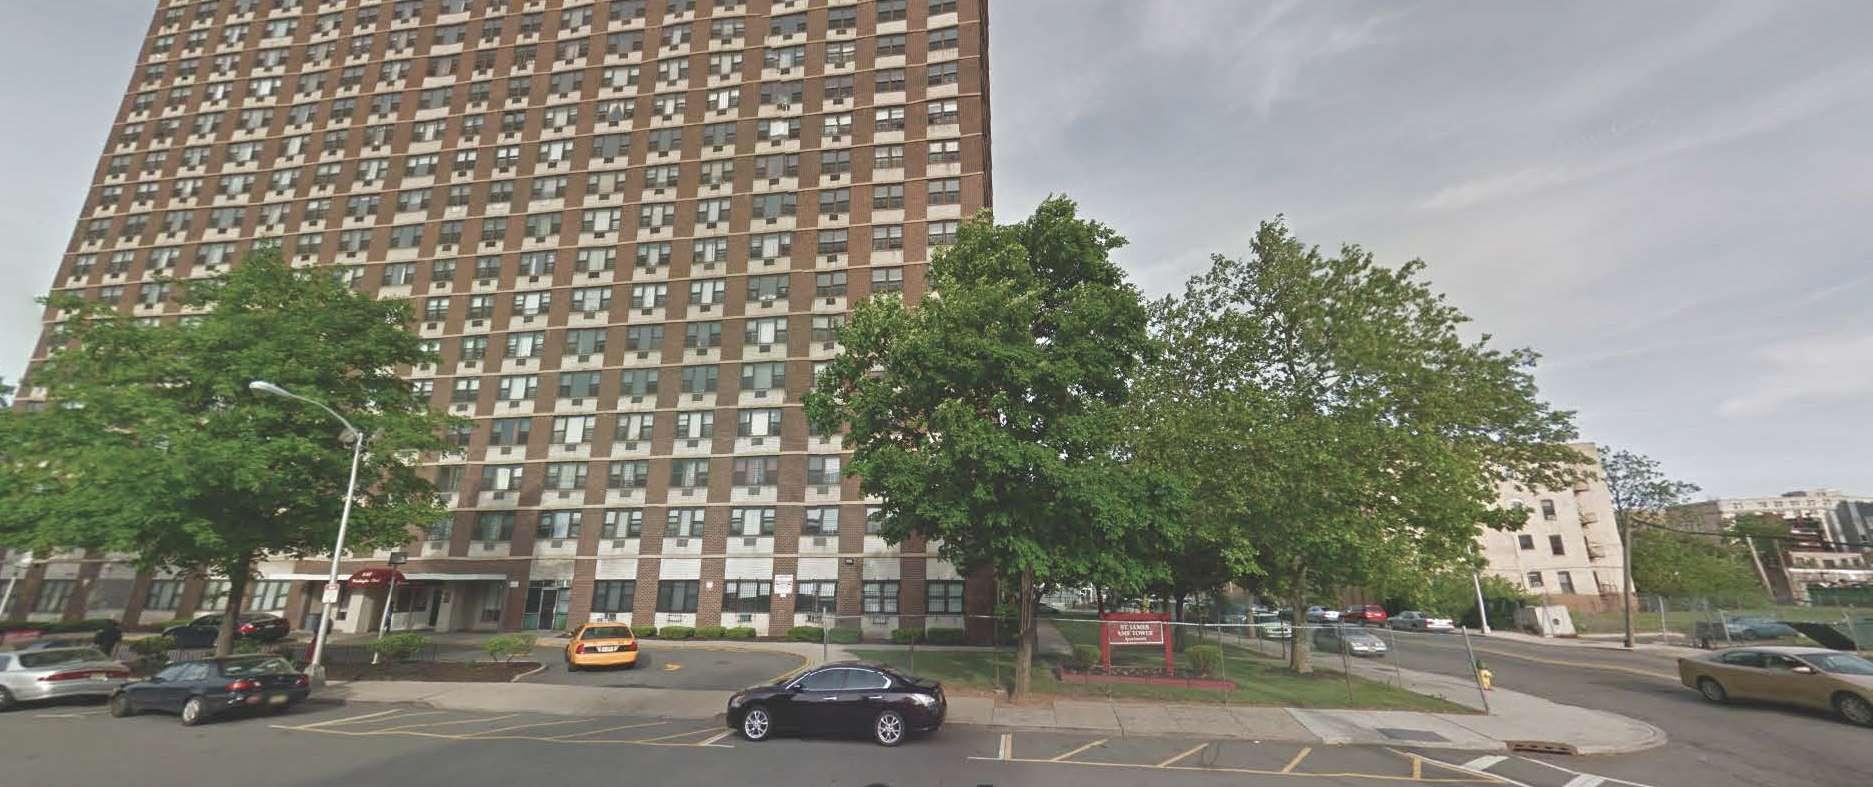 Upper Saddle River Nj >> 440 Washington St - Newark, NJ - Concord Consulting Engineering PC